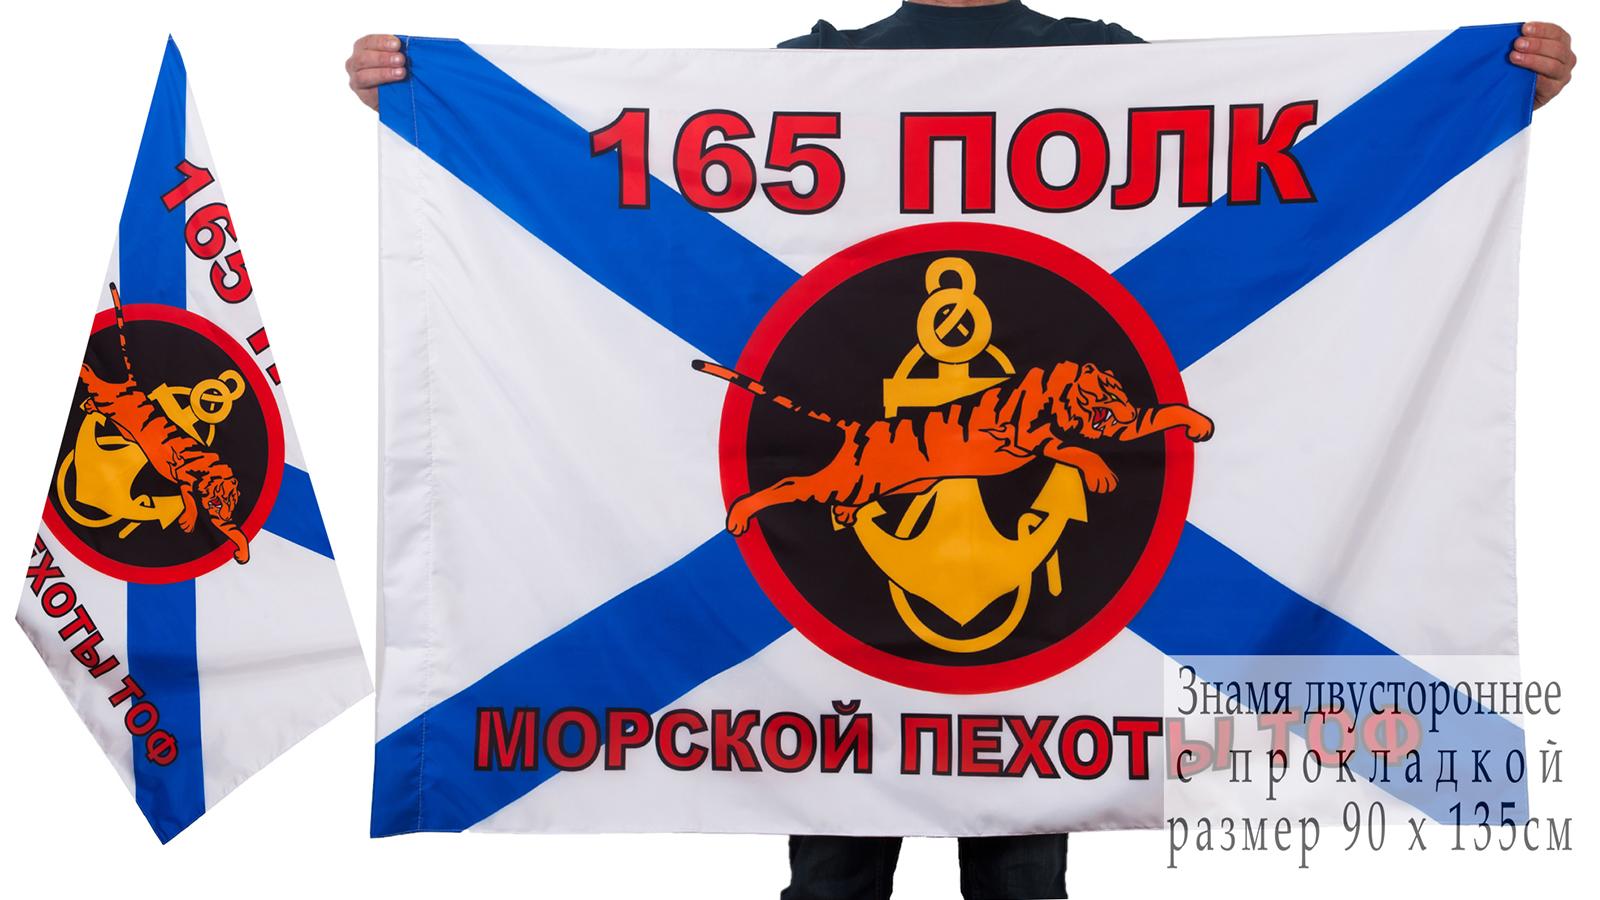 Двухсторонний флаг 165-го полка Морской пехоты